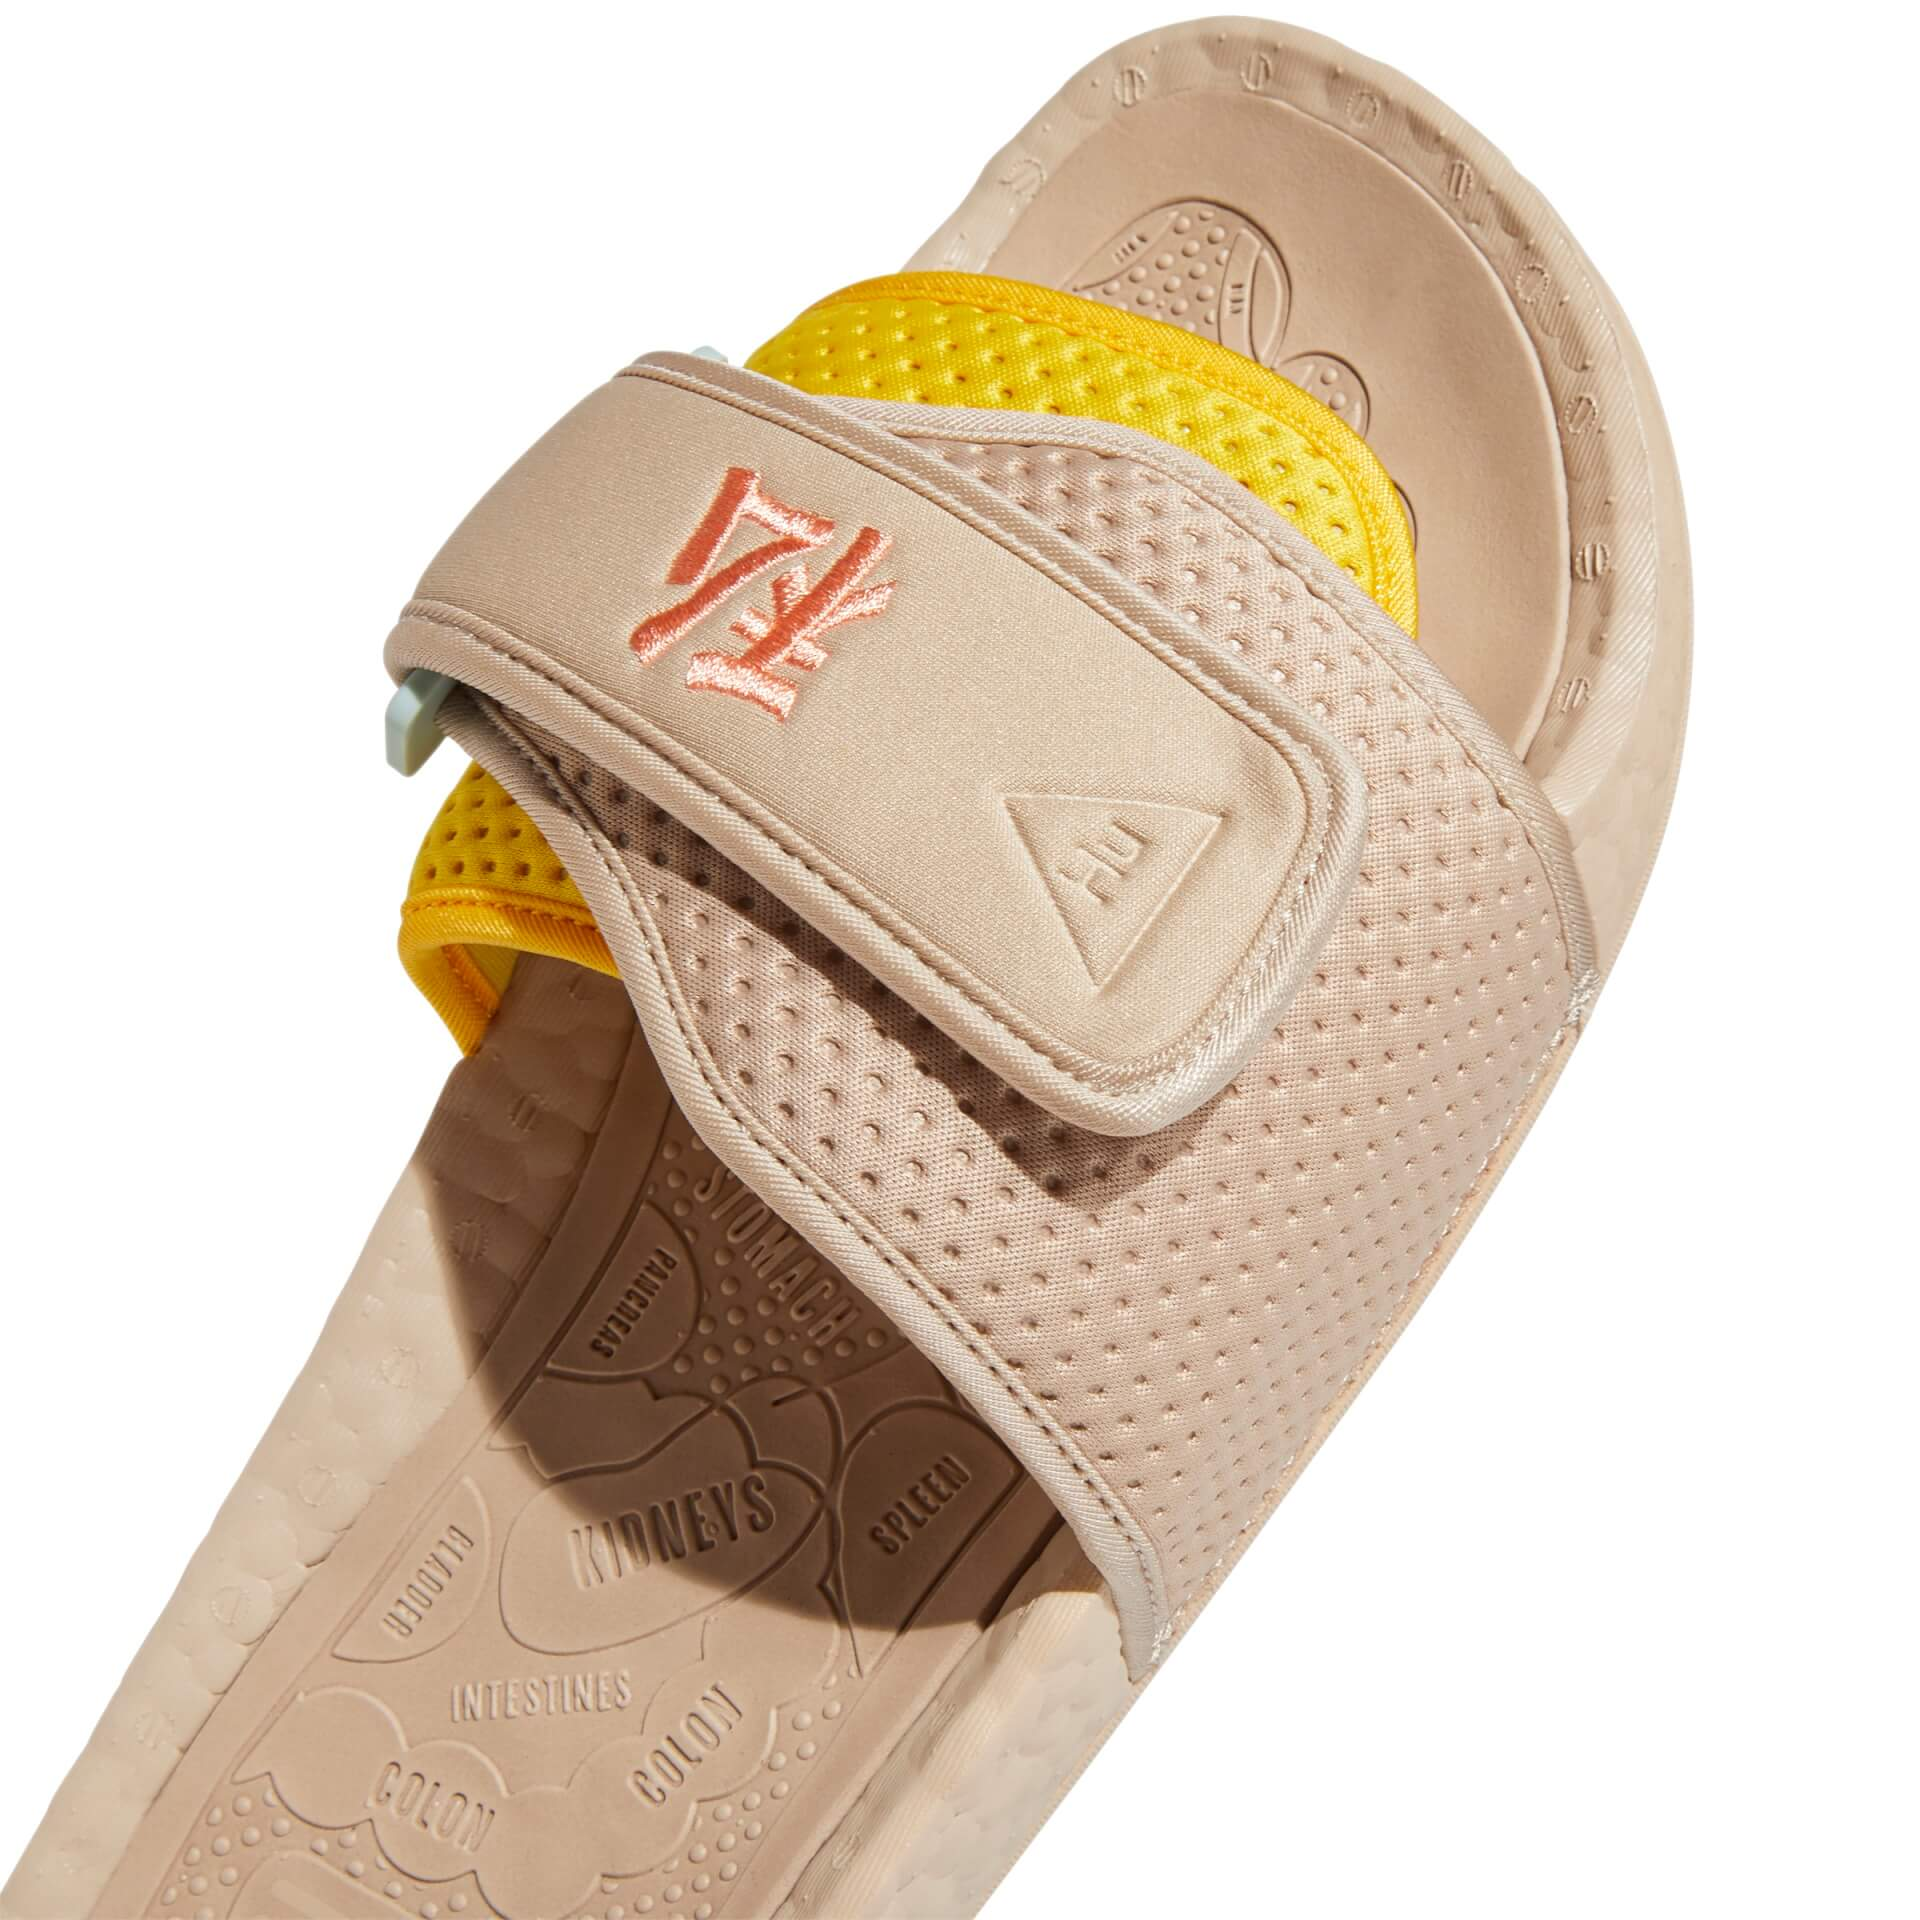 adidas Originalsから『Pharrell Williams x NIGO(R)FRIENDSHIP PACK』が発売!2種類のフットウェアが登場 fashion201217_adidas_pharrell_nigo_11